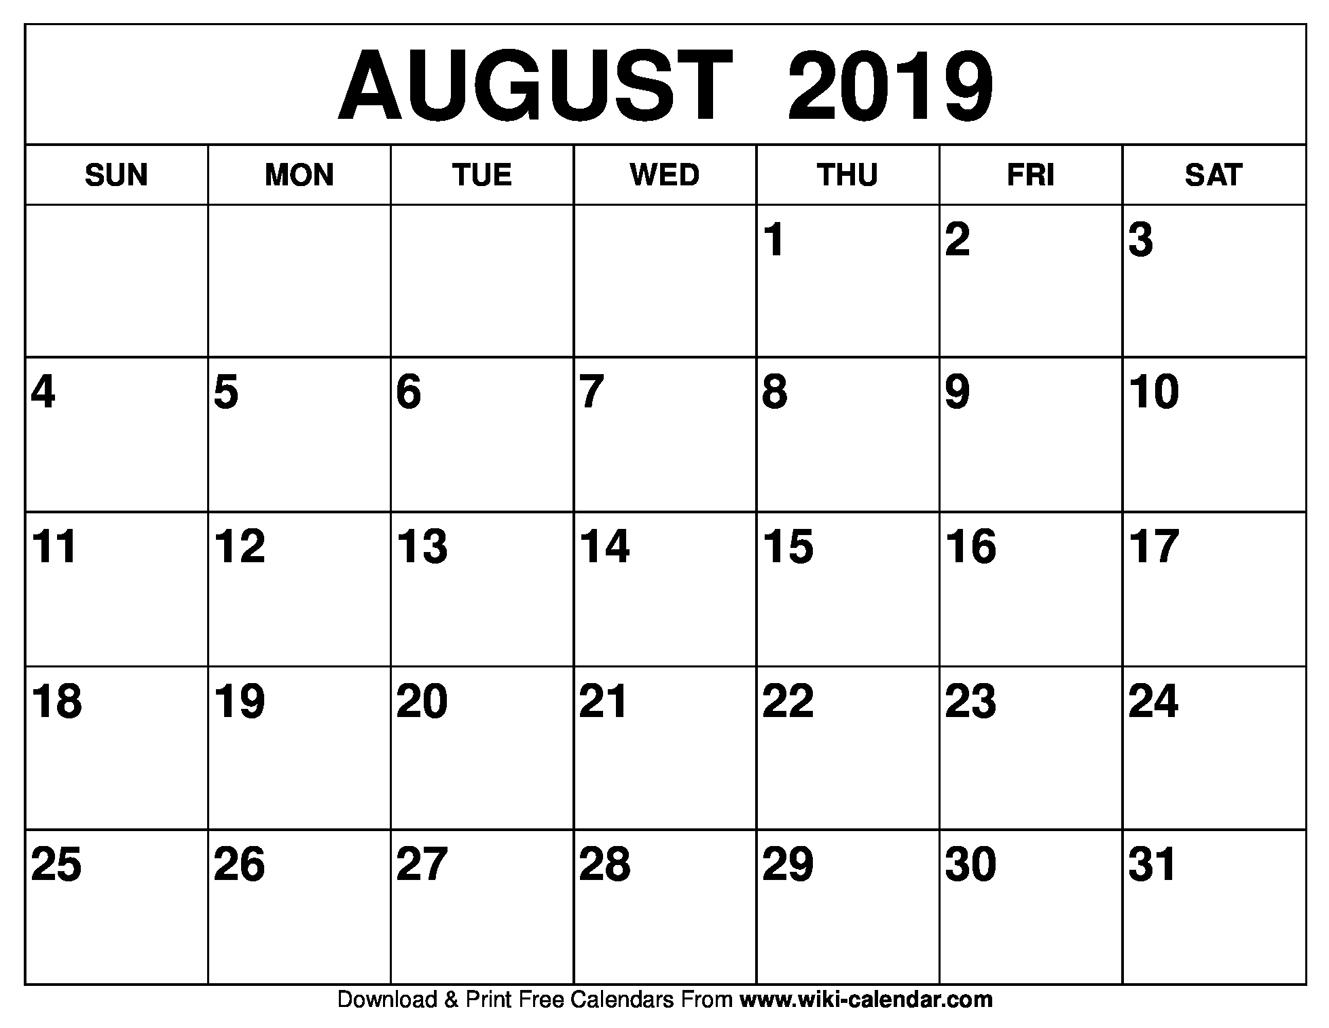 Printable Calendar Template August 2019 As Pdf And Jpg